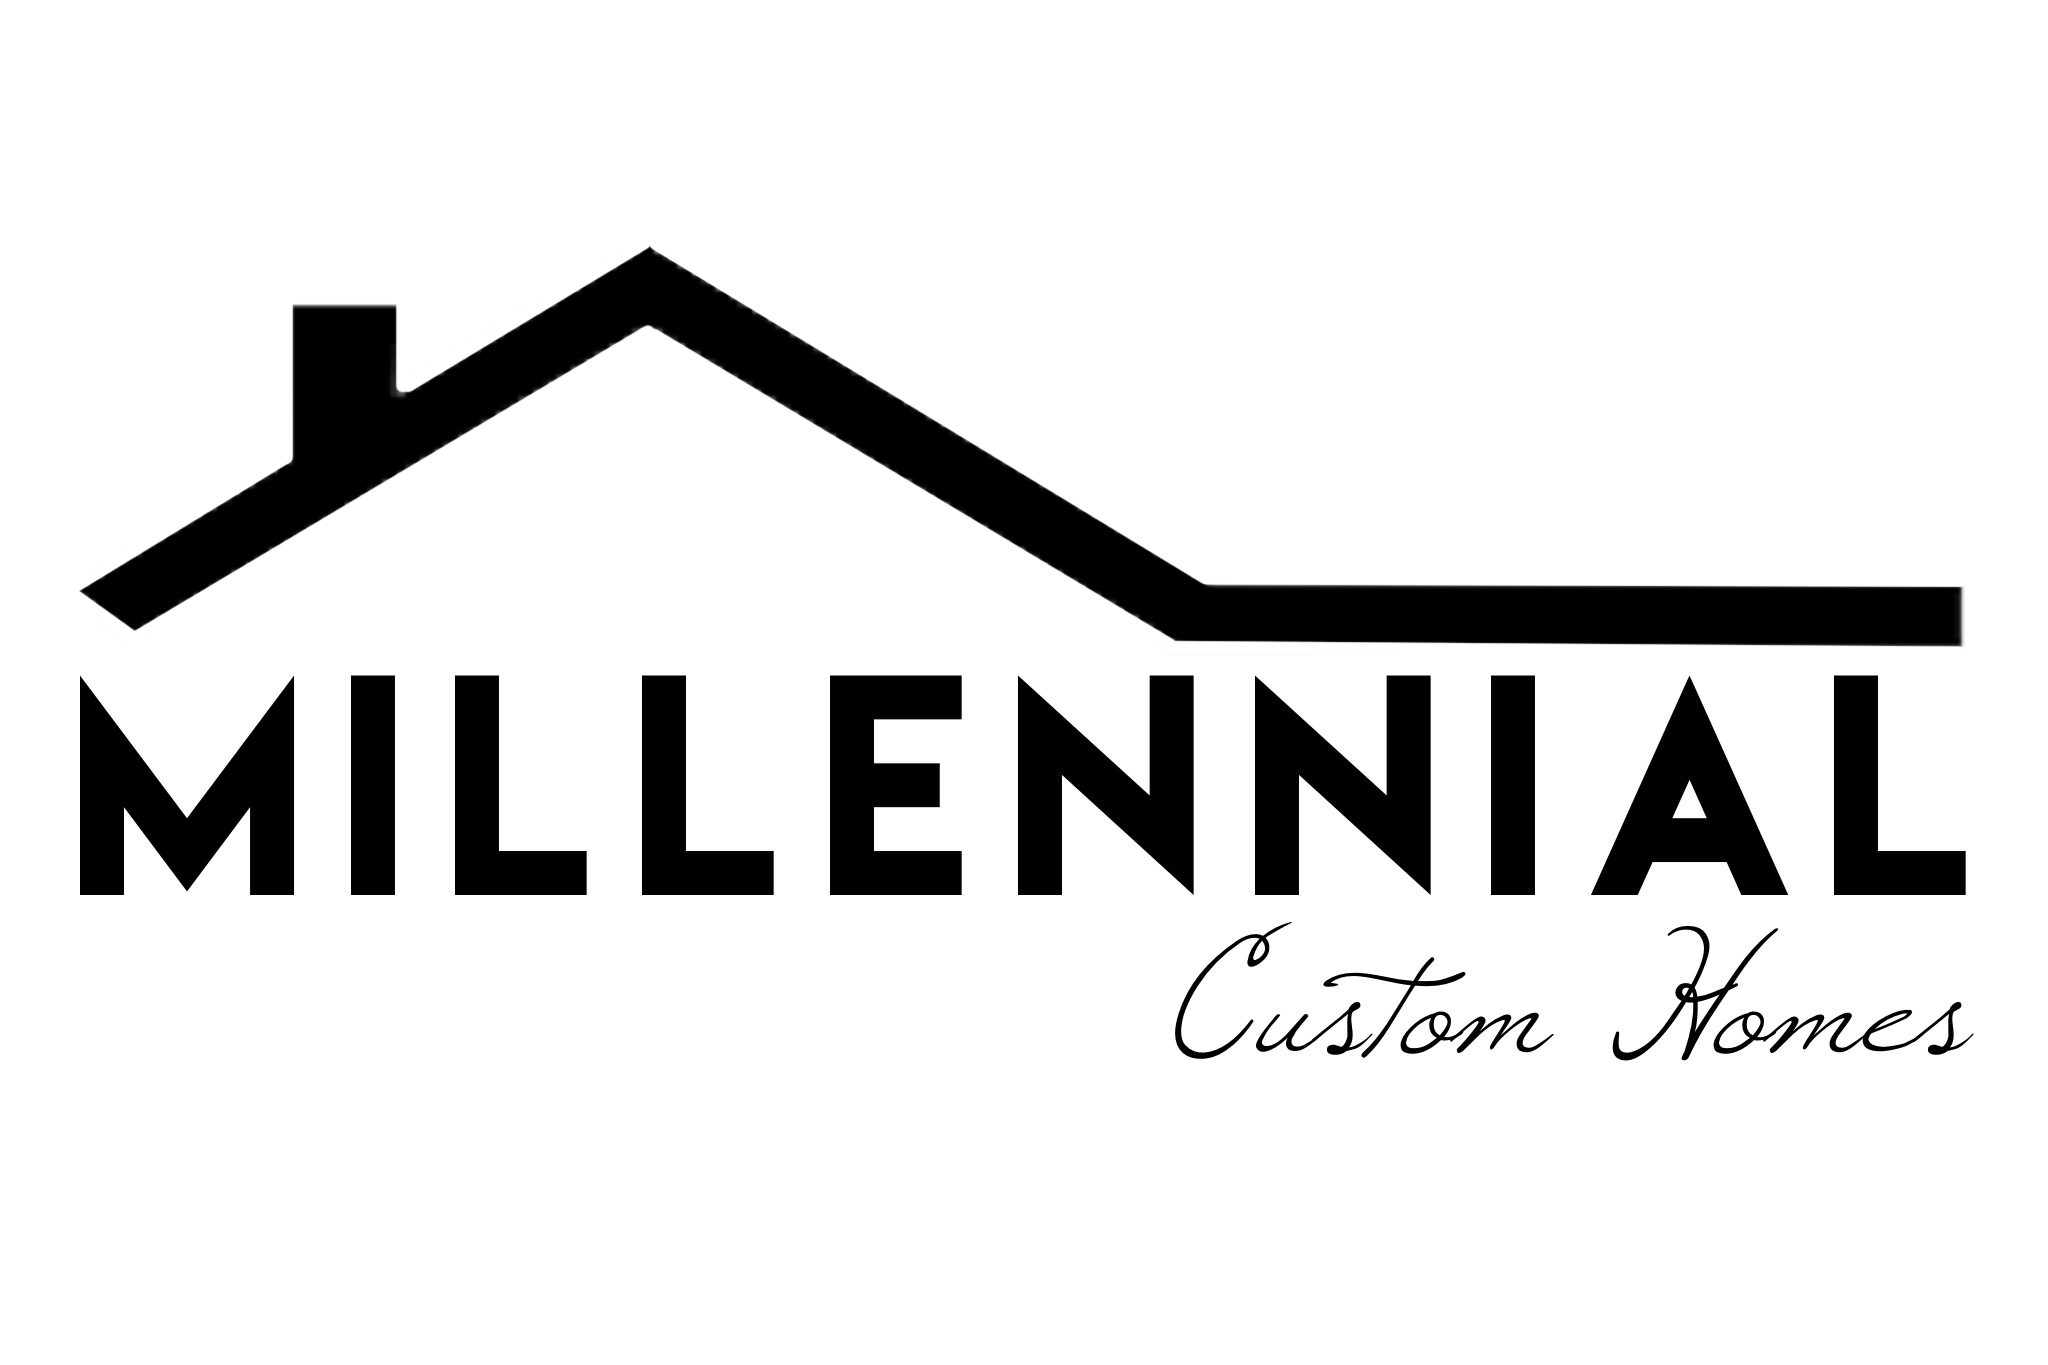 Millennial Custom Homes